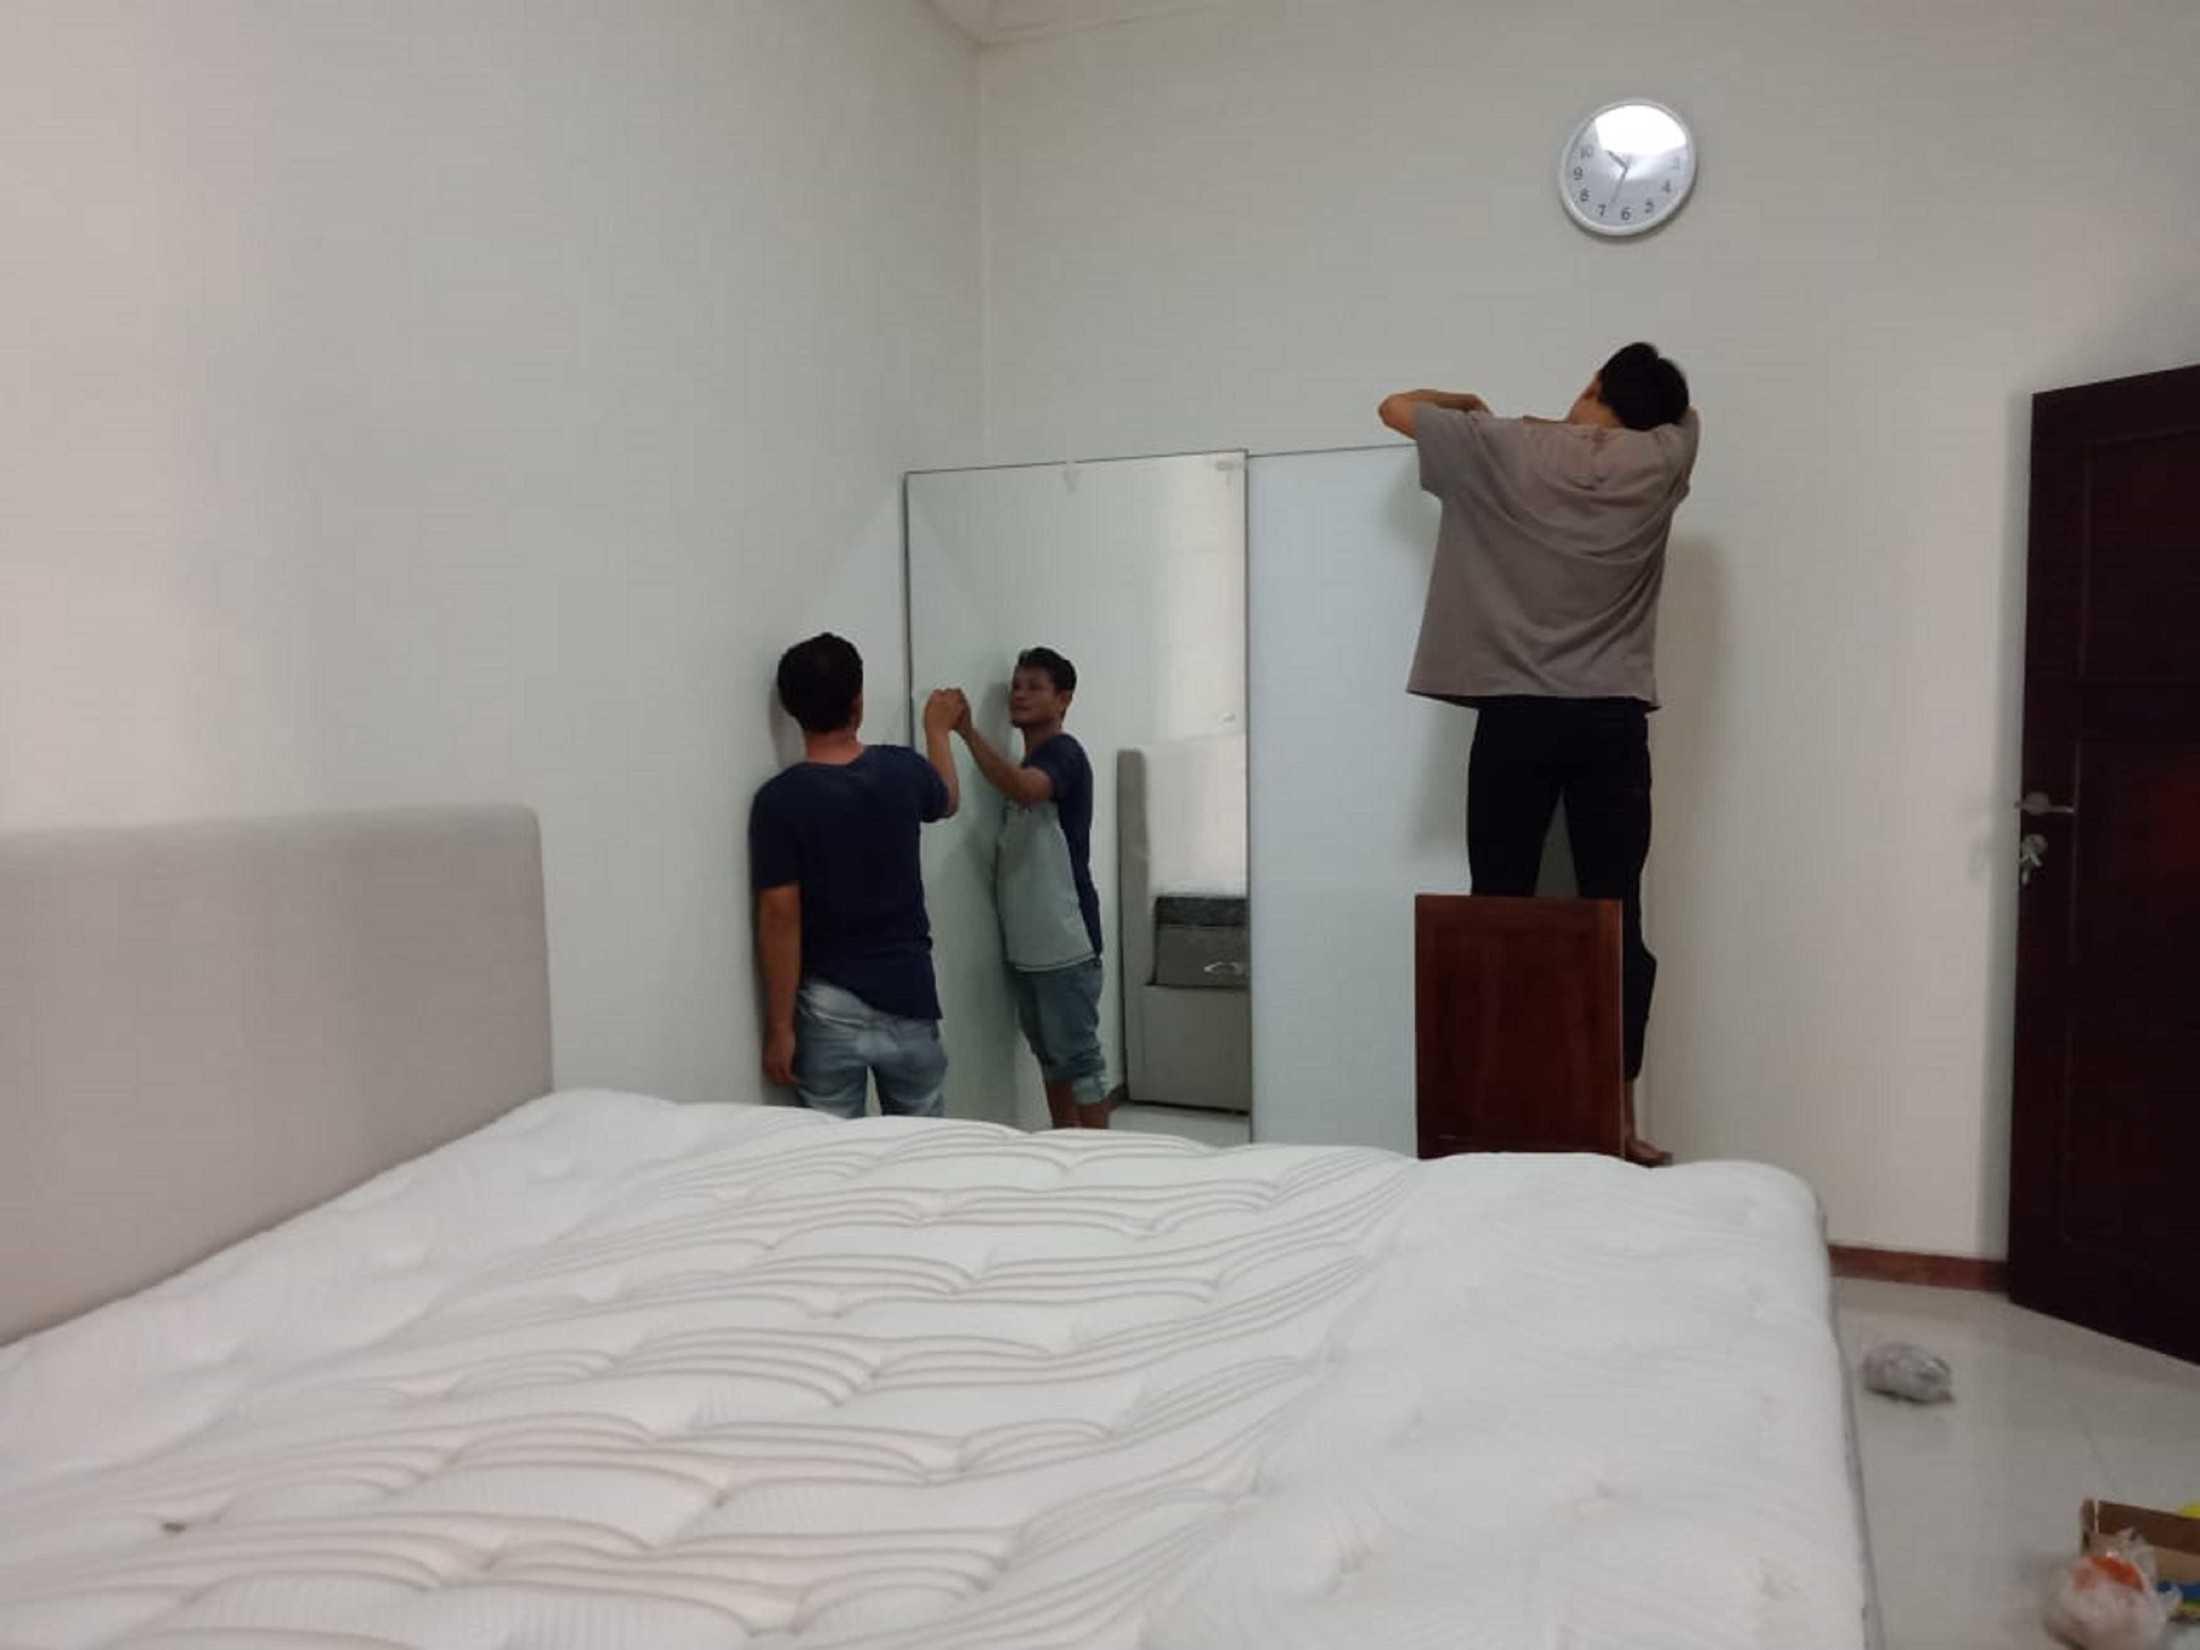 Rekoo Indonesia Bedroom Makeover Surabaya, Kota Sby, Jawa Timur, Indonesia Surabaya, Kota Sby, Jawa Timur, Indonesia Rekoo-Indonesia-Bedroom-Makeover  128761